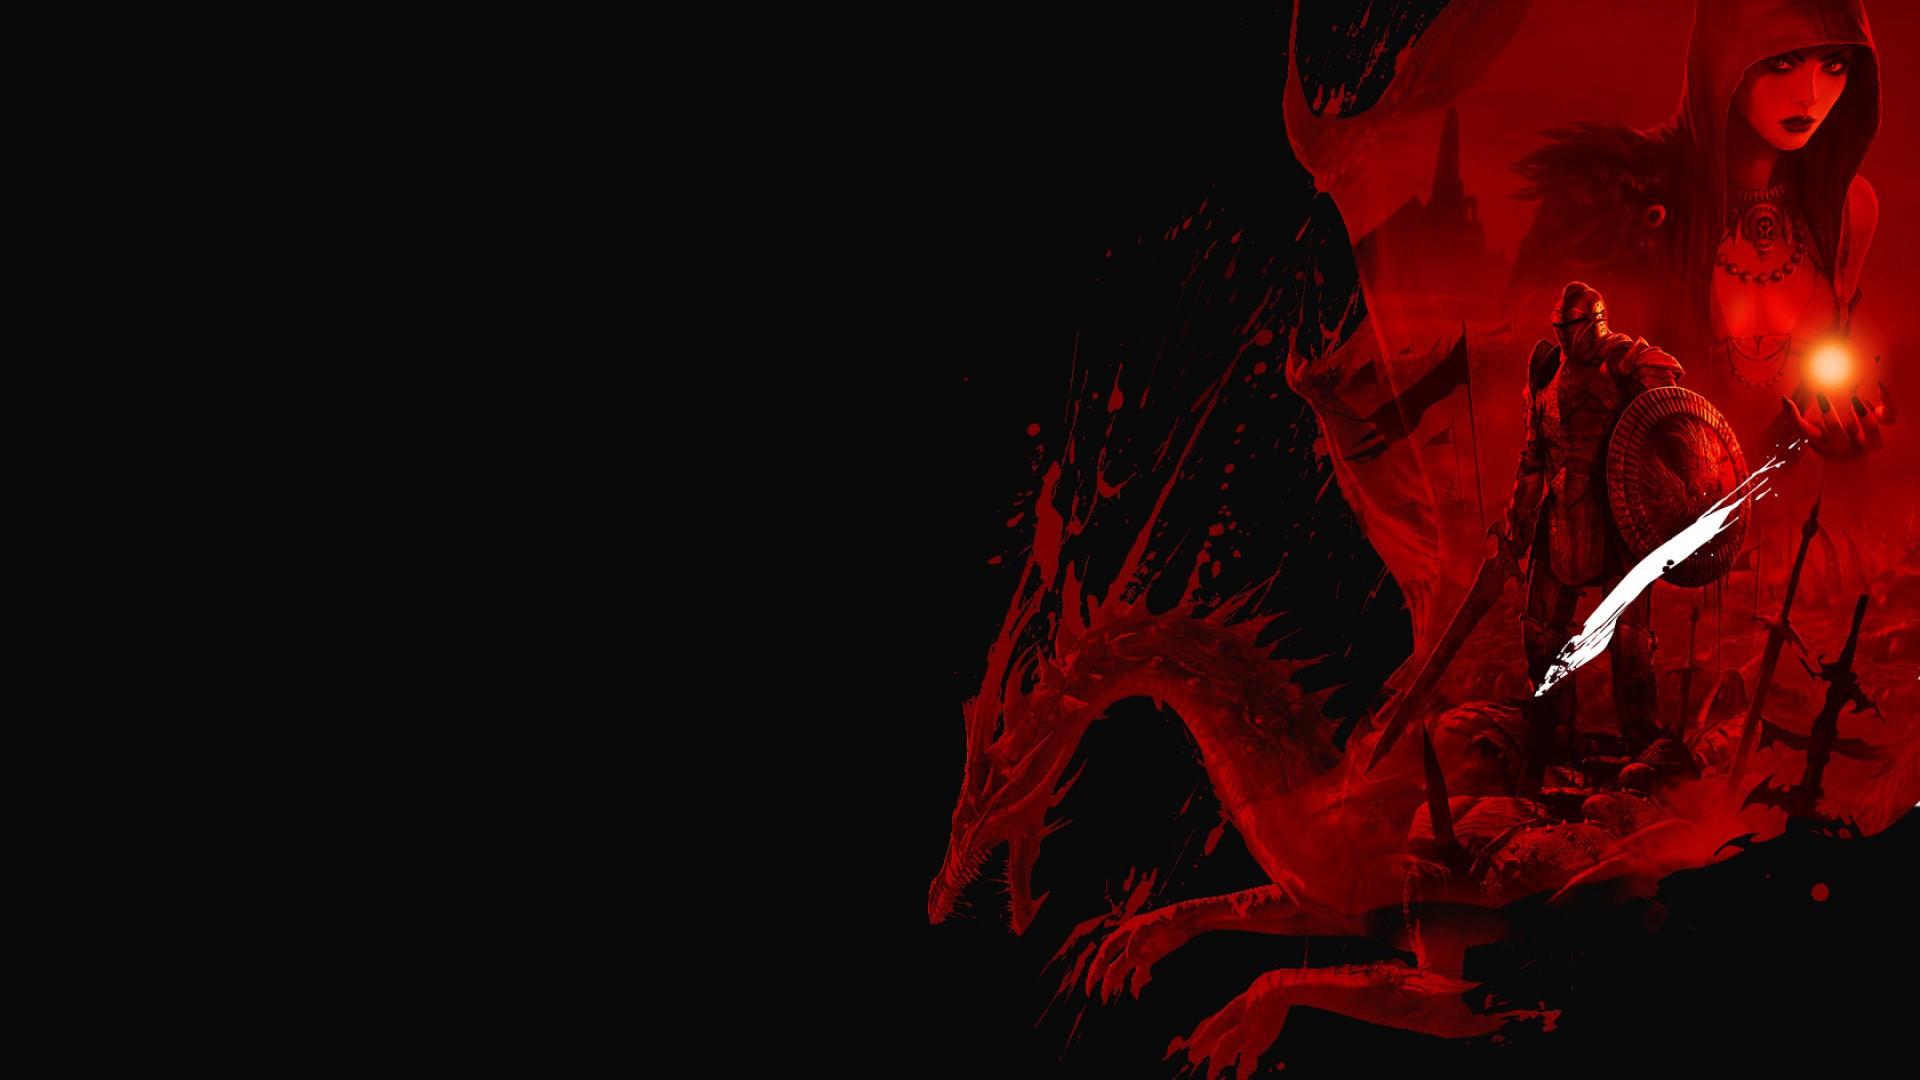 Red Dragon dragon black red 1920x1080 Masast hd geni ekran 1920x1080